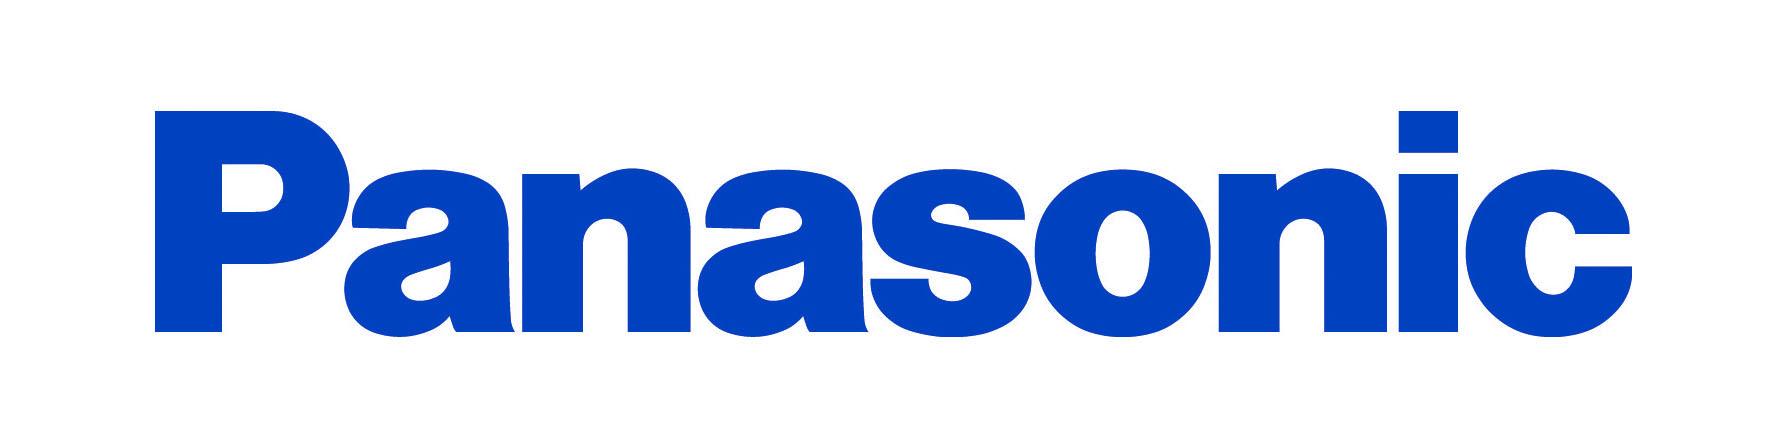 Panasonic_logo(パナソニックロゴ)